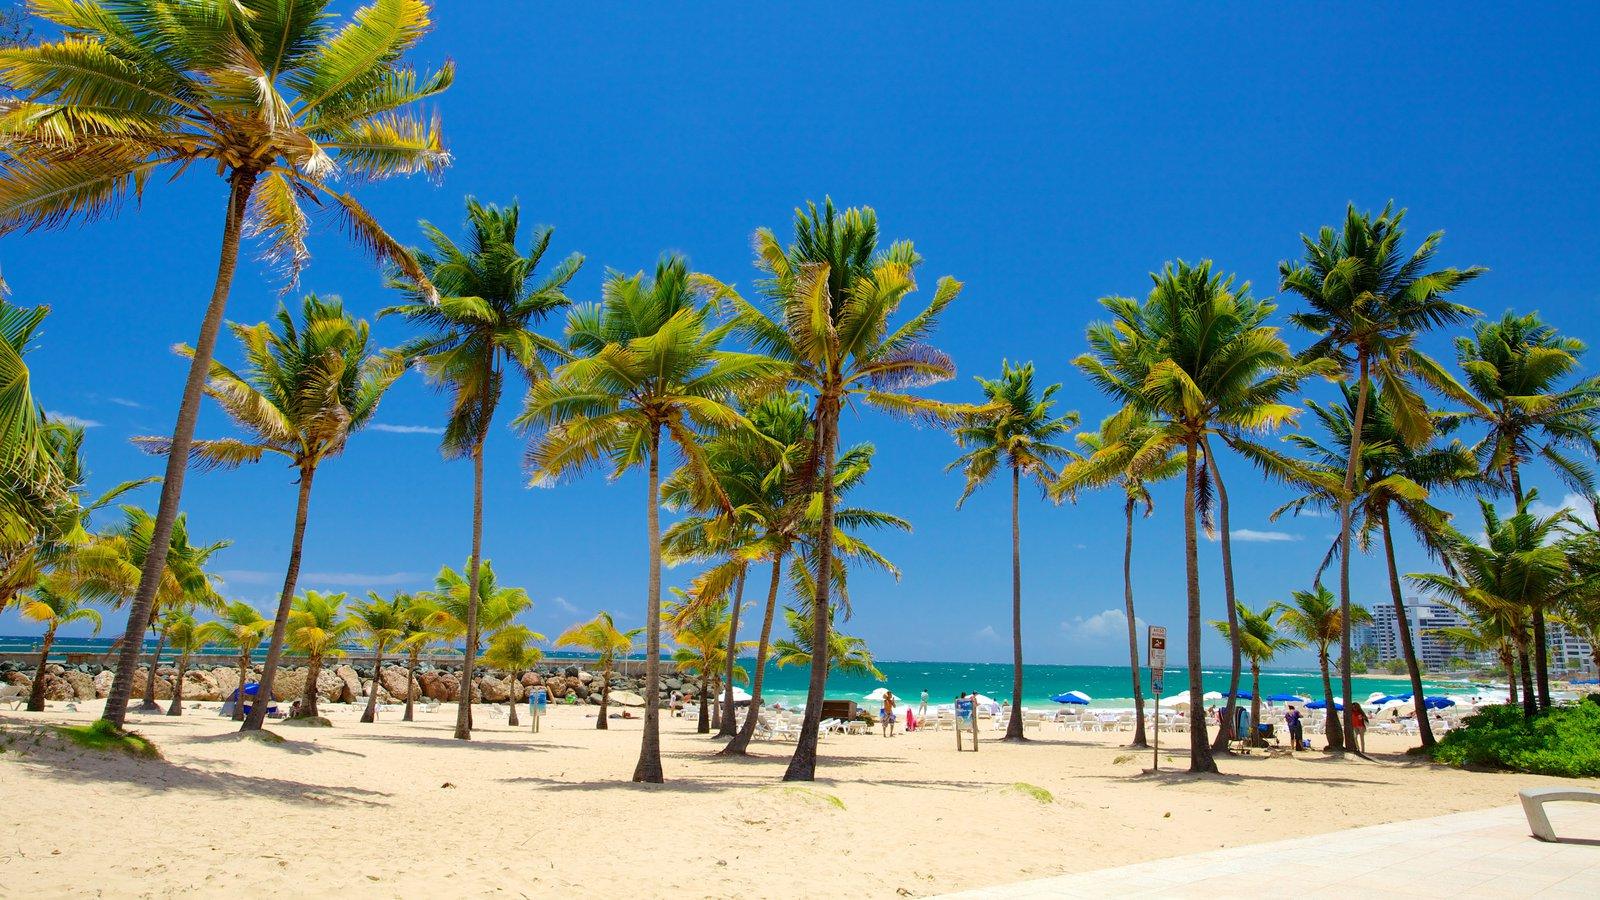 Condado Beach Showing Tropical Scenes And A Sandy